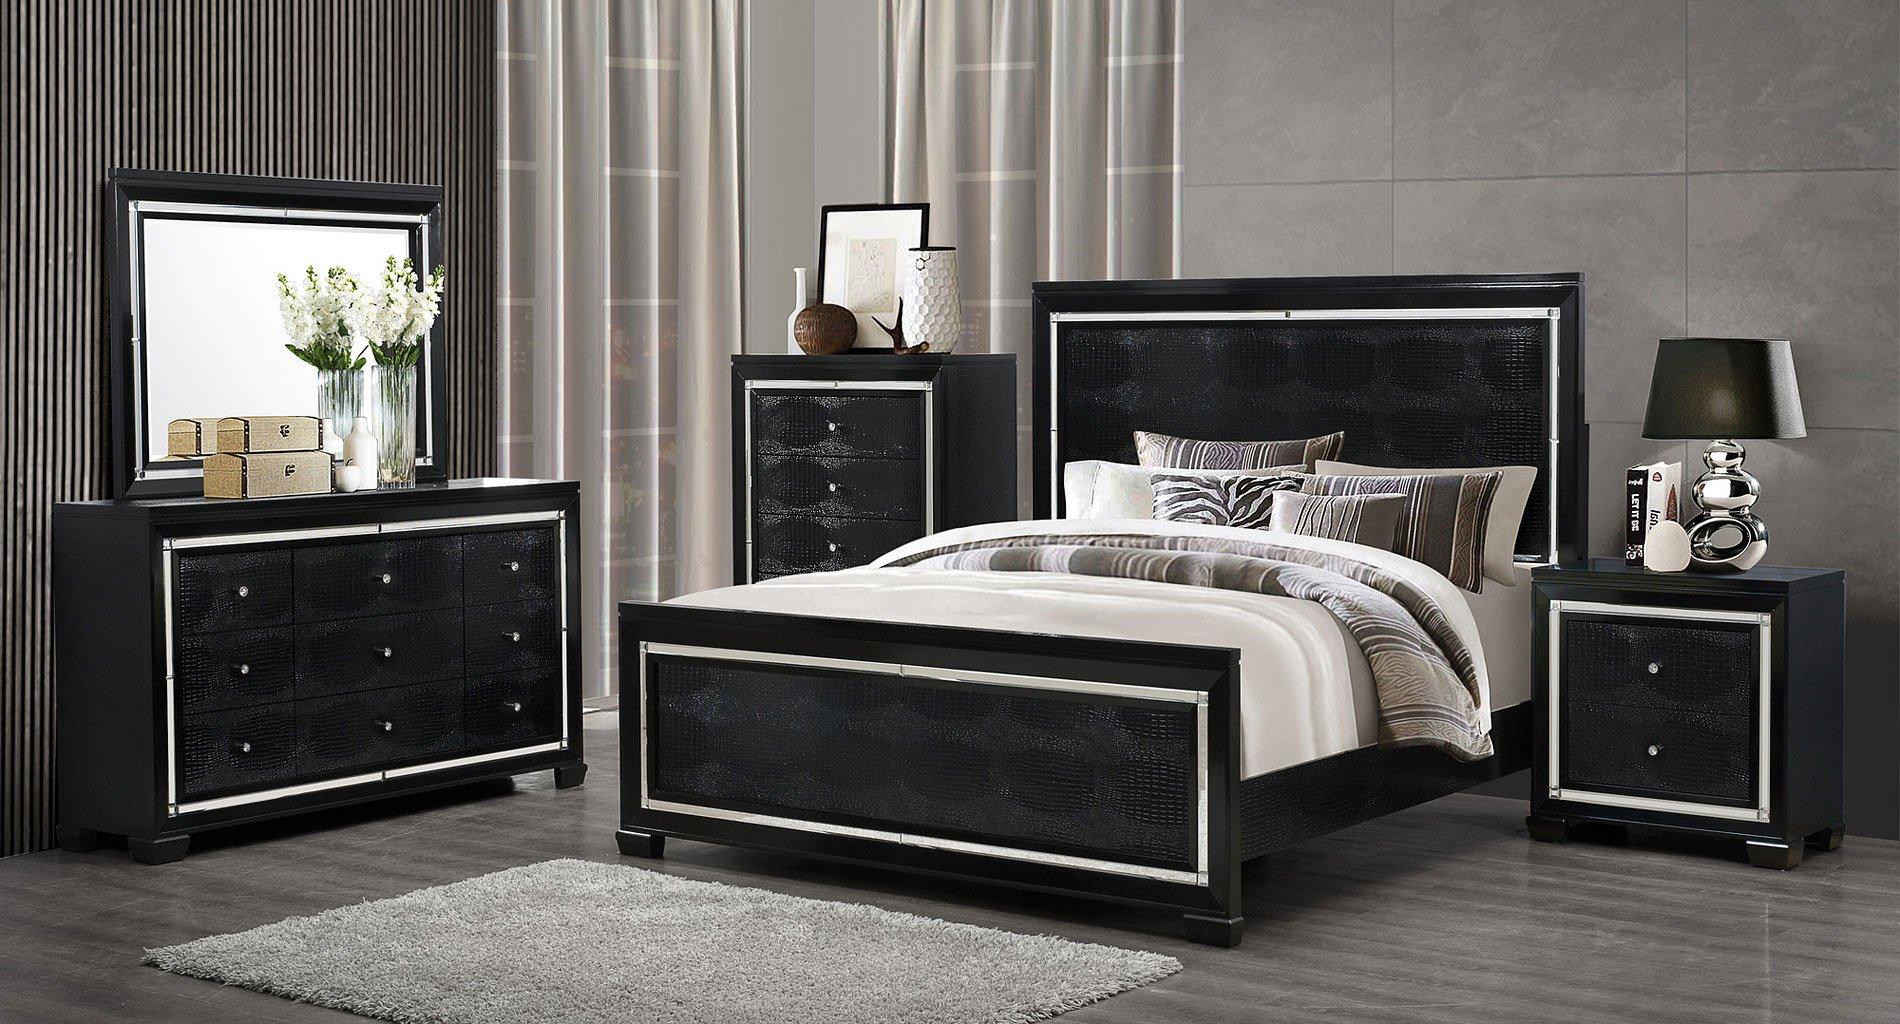 galaxy panel bedroom set global furniture furniture cart rh furniturecart com Galaxy Bedroom Set Box ashley galaxy bedroom set